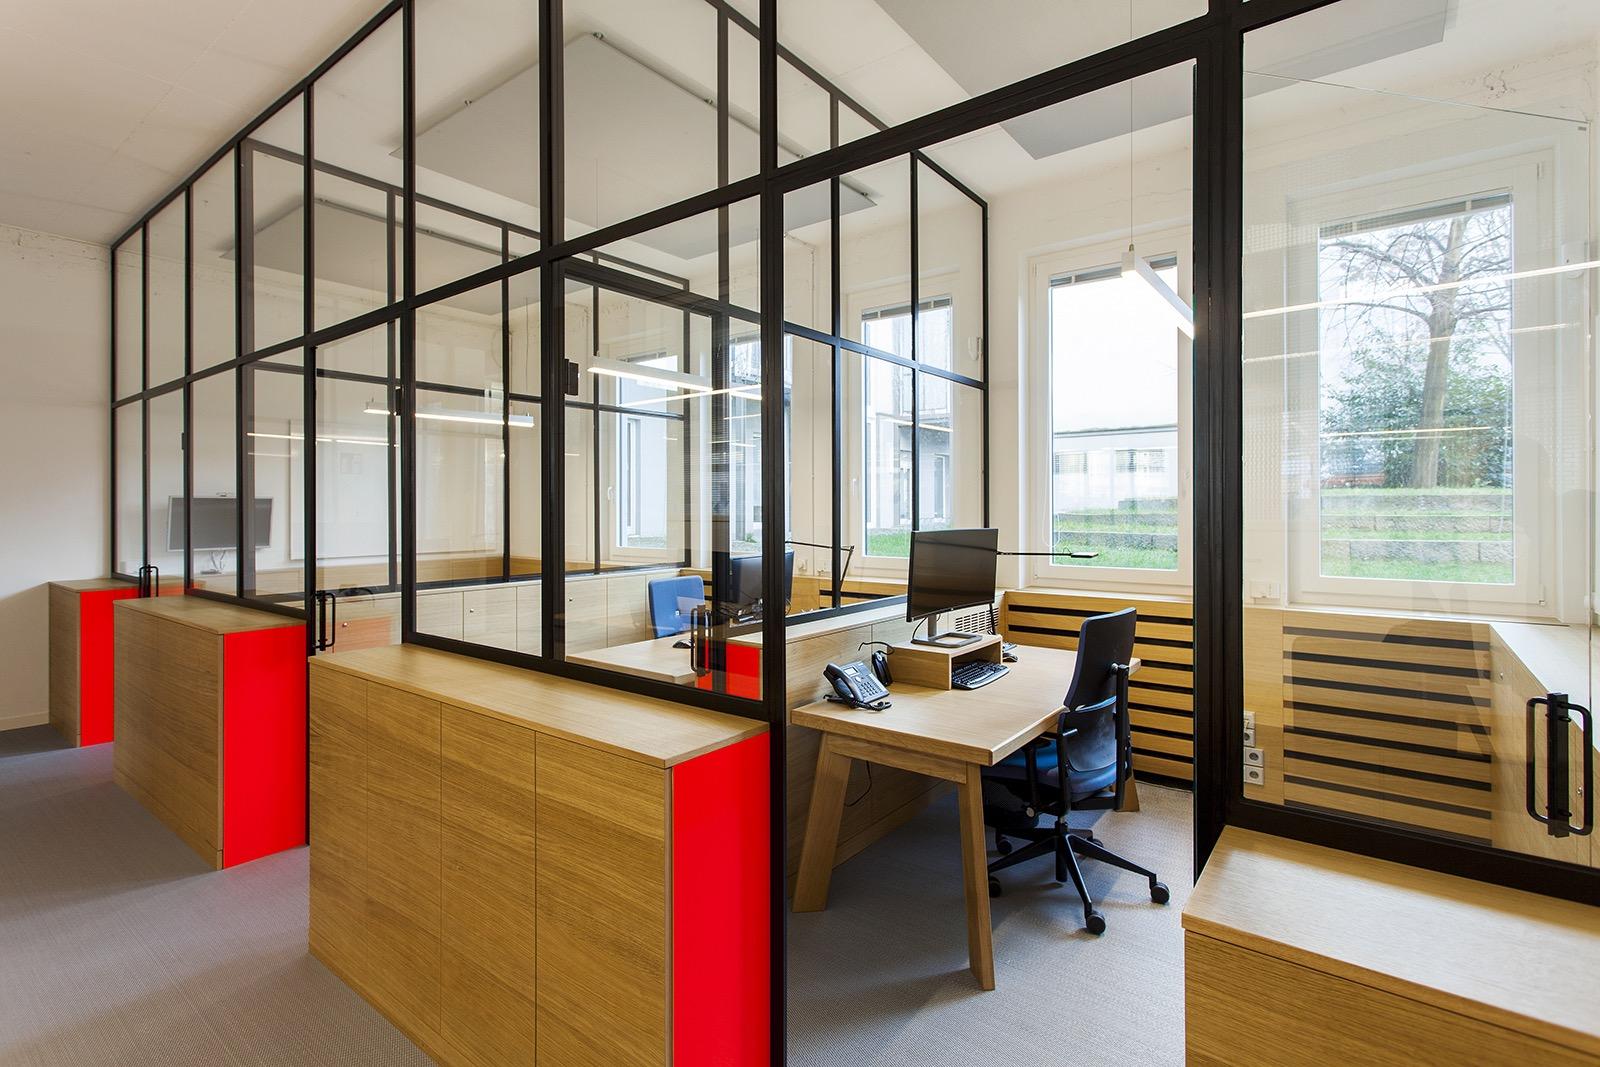 a look inside wall ag s berlin office officelovin 39. Black Bedroom Furniture Sets. Home Design Ideas